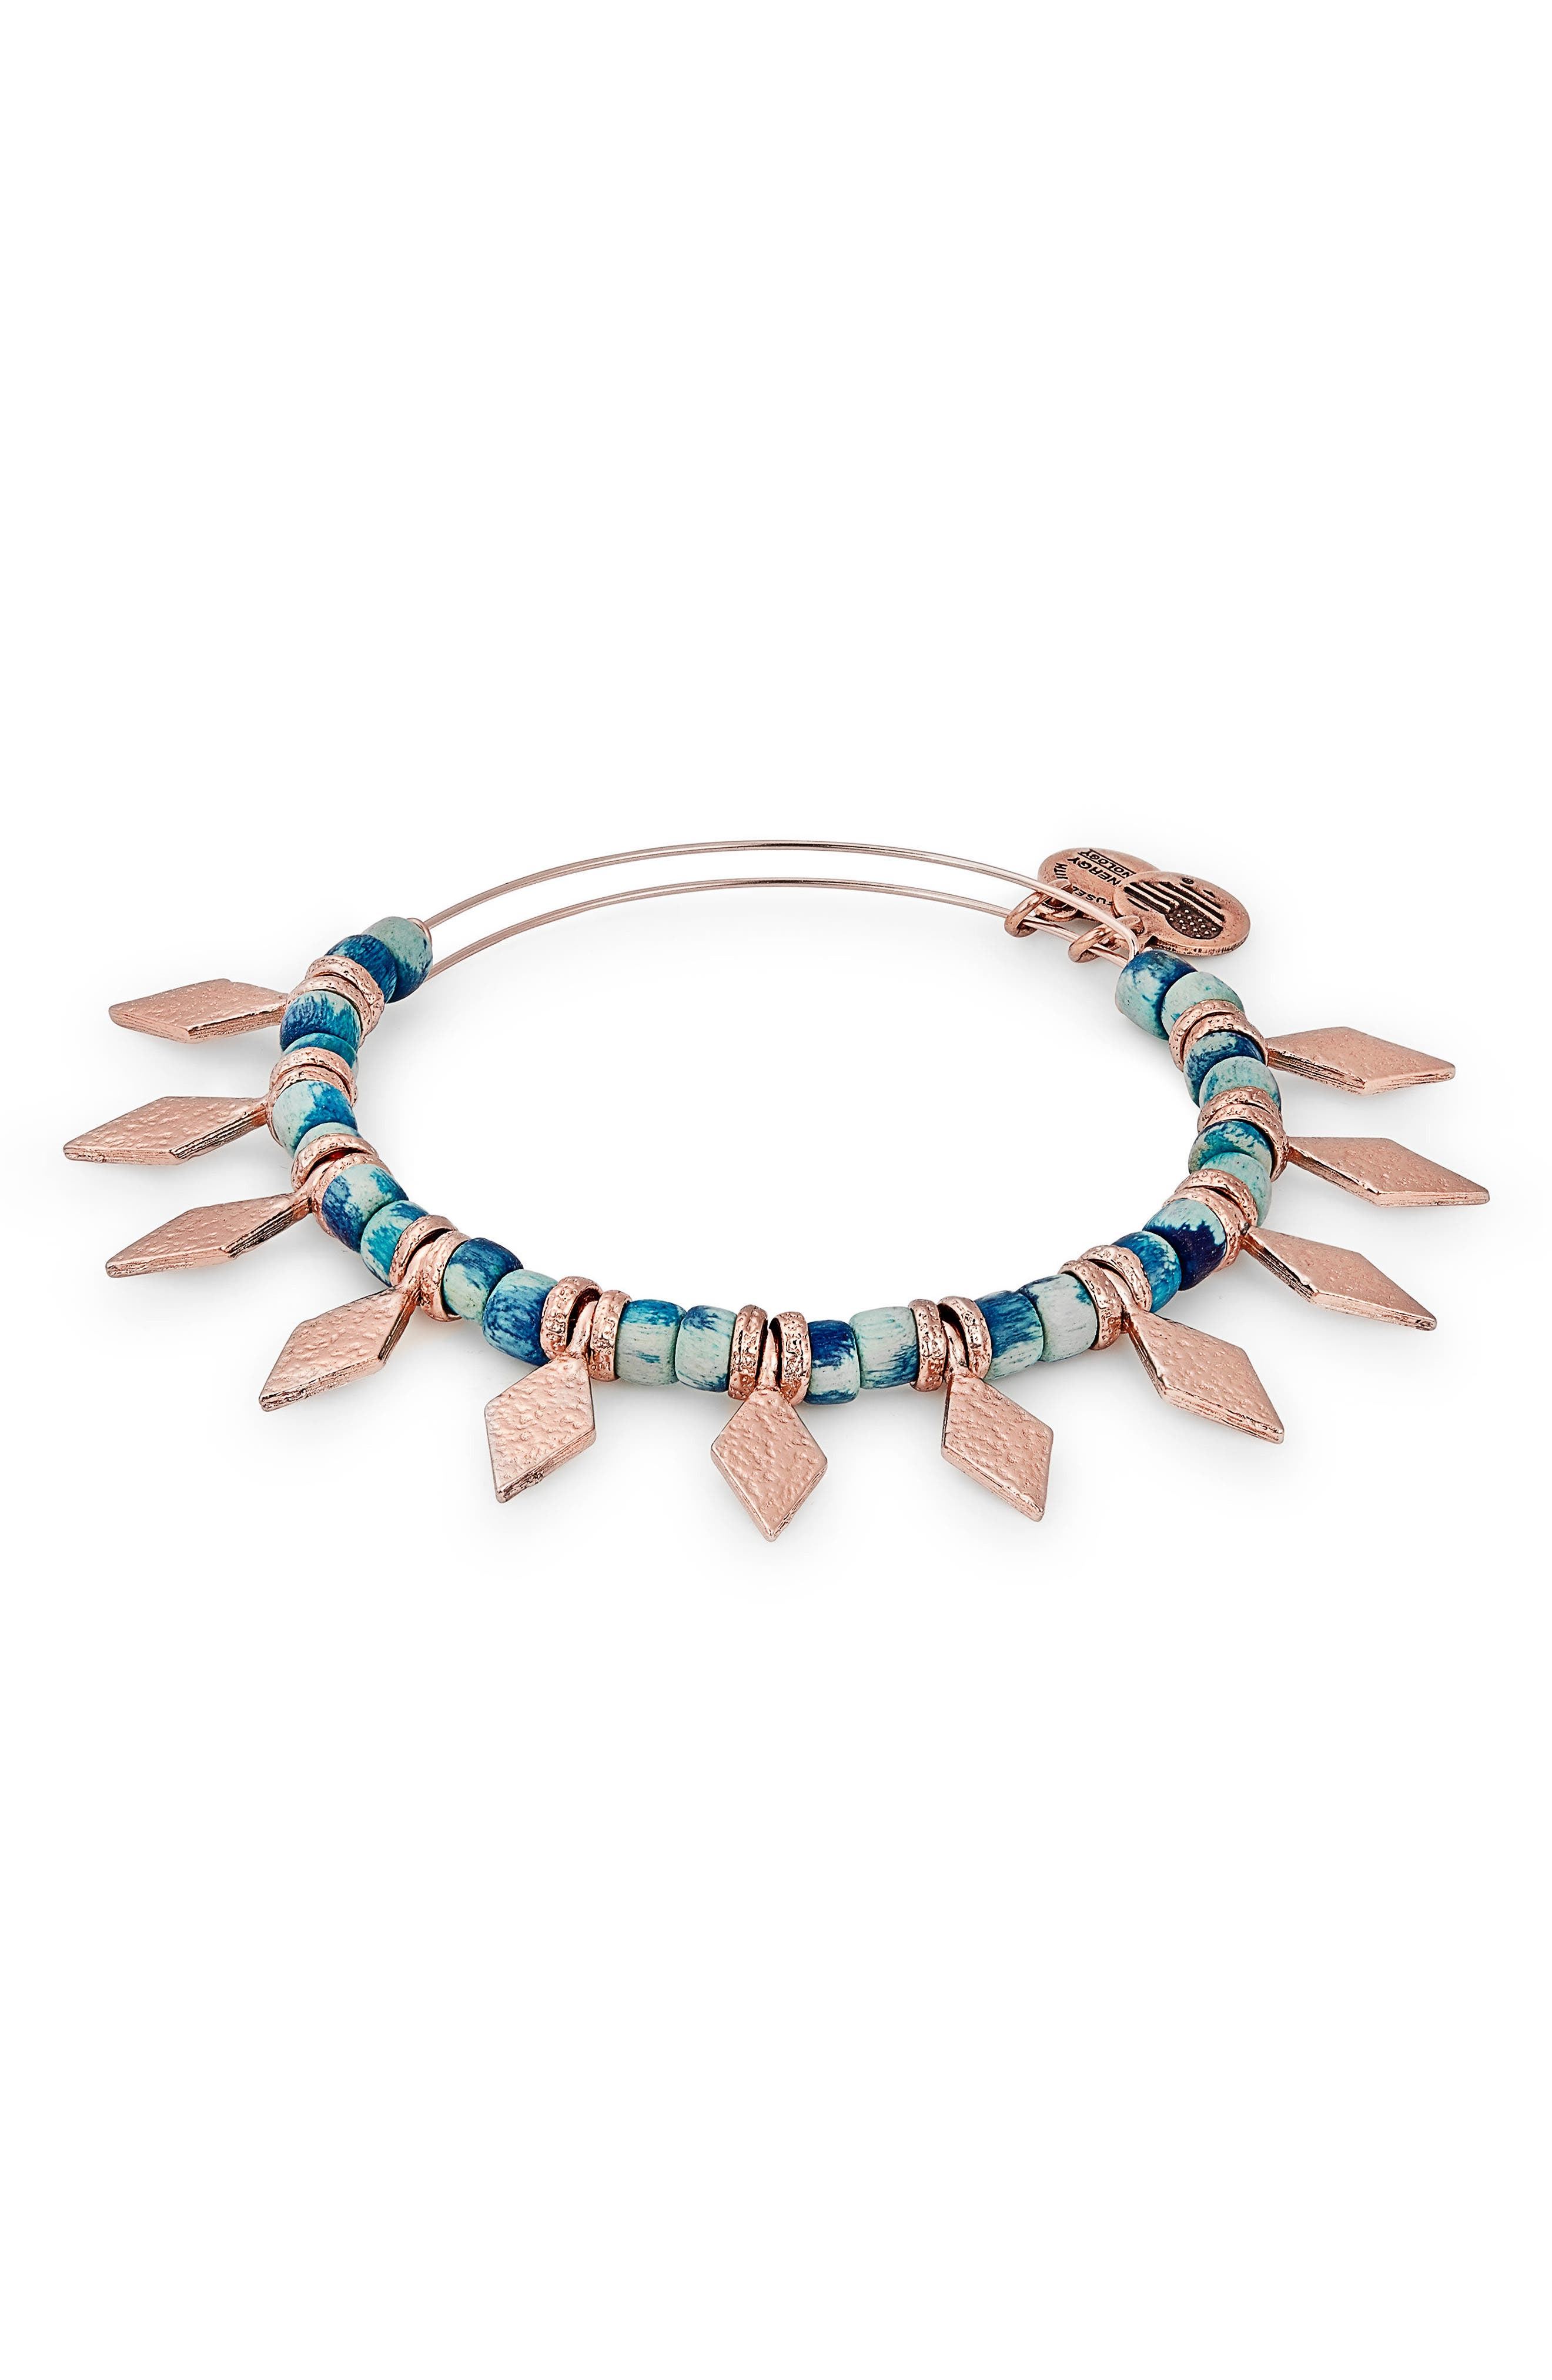 Spearhead Ocean Adjustable Bracelet,                             Main thumbnail 1, color,                             Rose Gold Multi